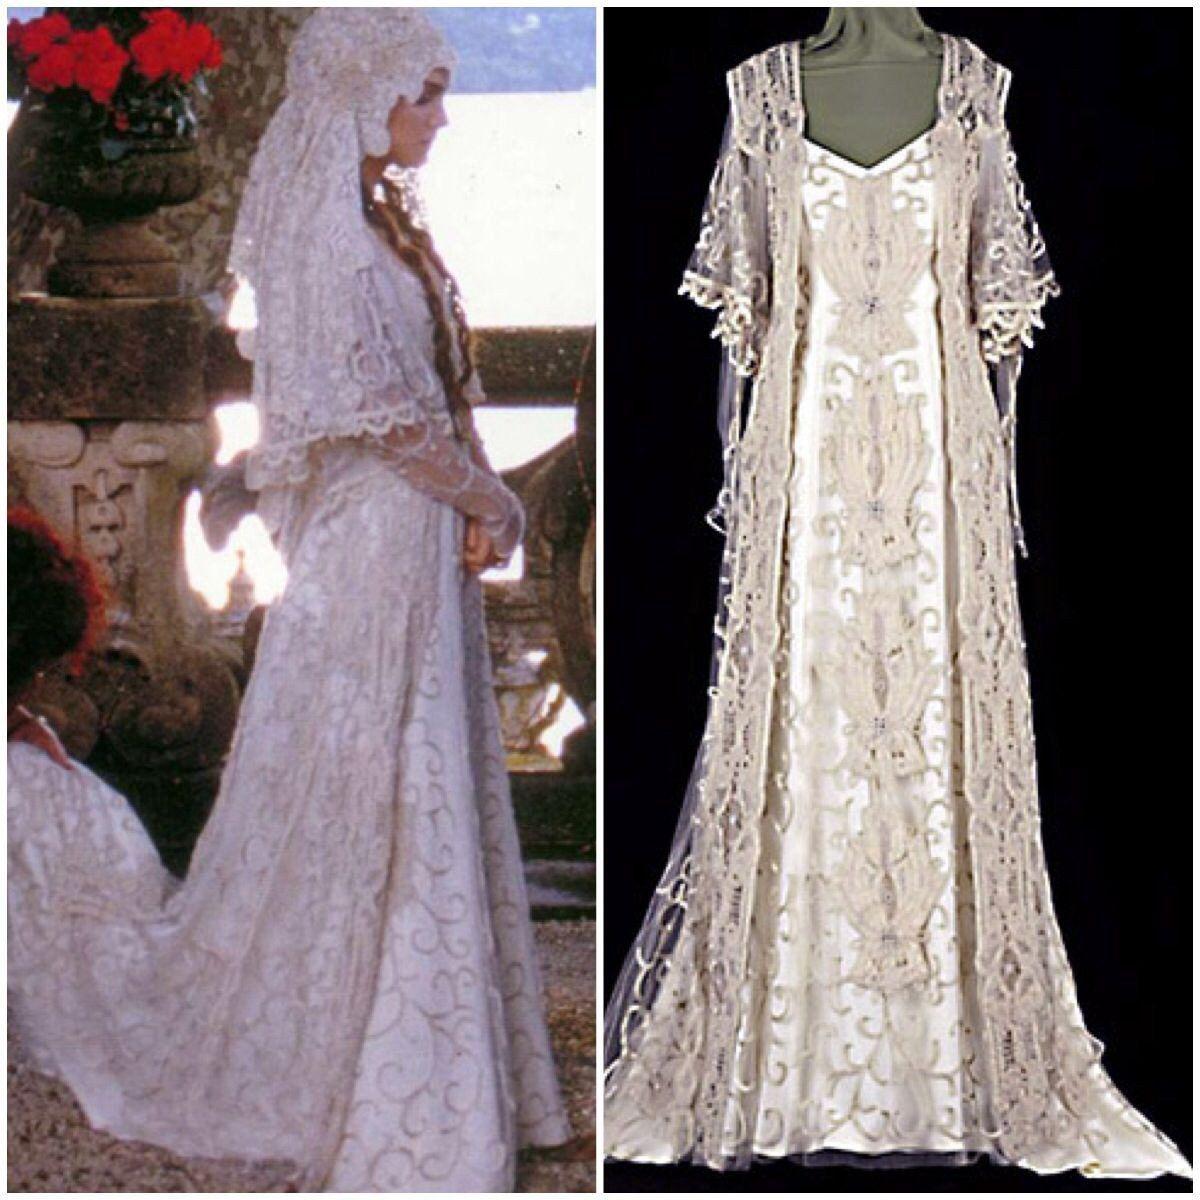 30 Padme Amidala Wedding Dress In 2020 Star Wars Wedding Dress